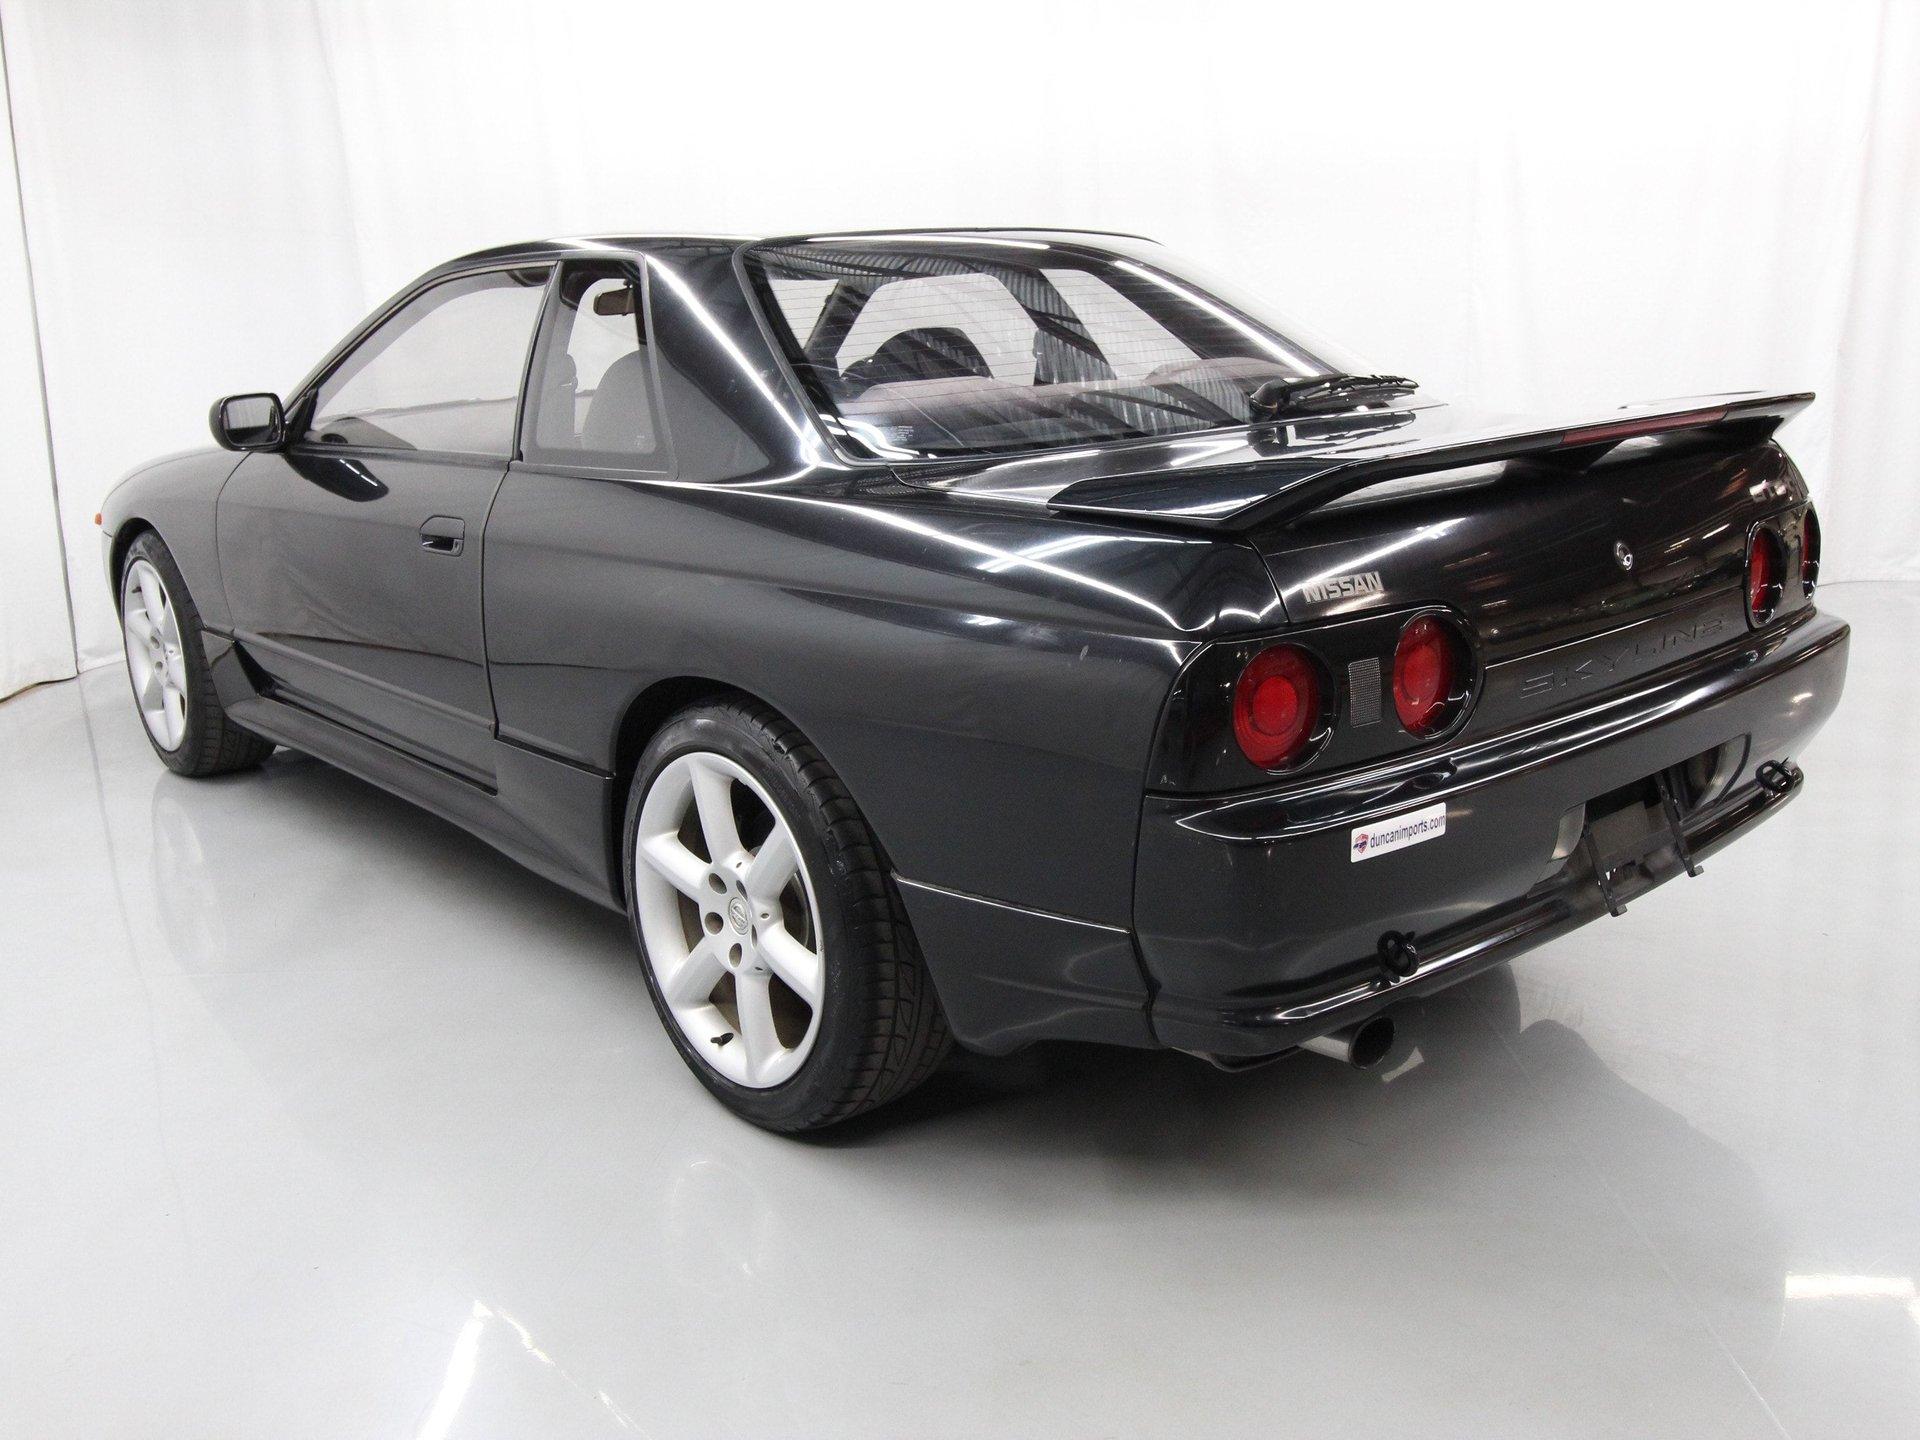 1989 Nissan Skyline